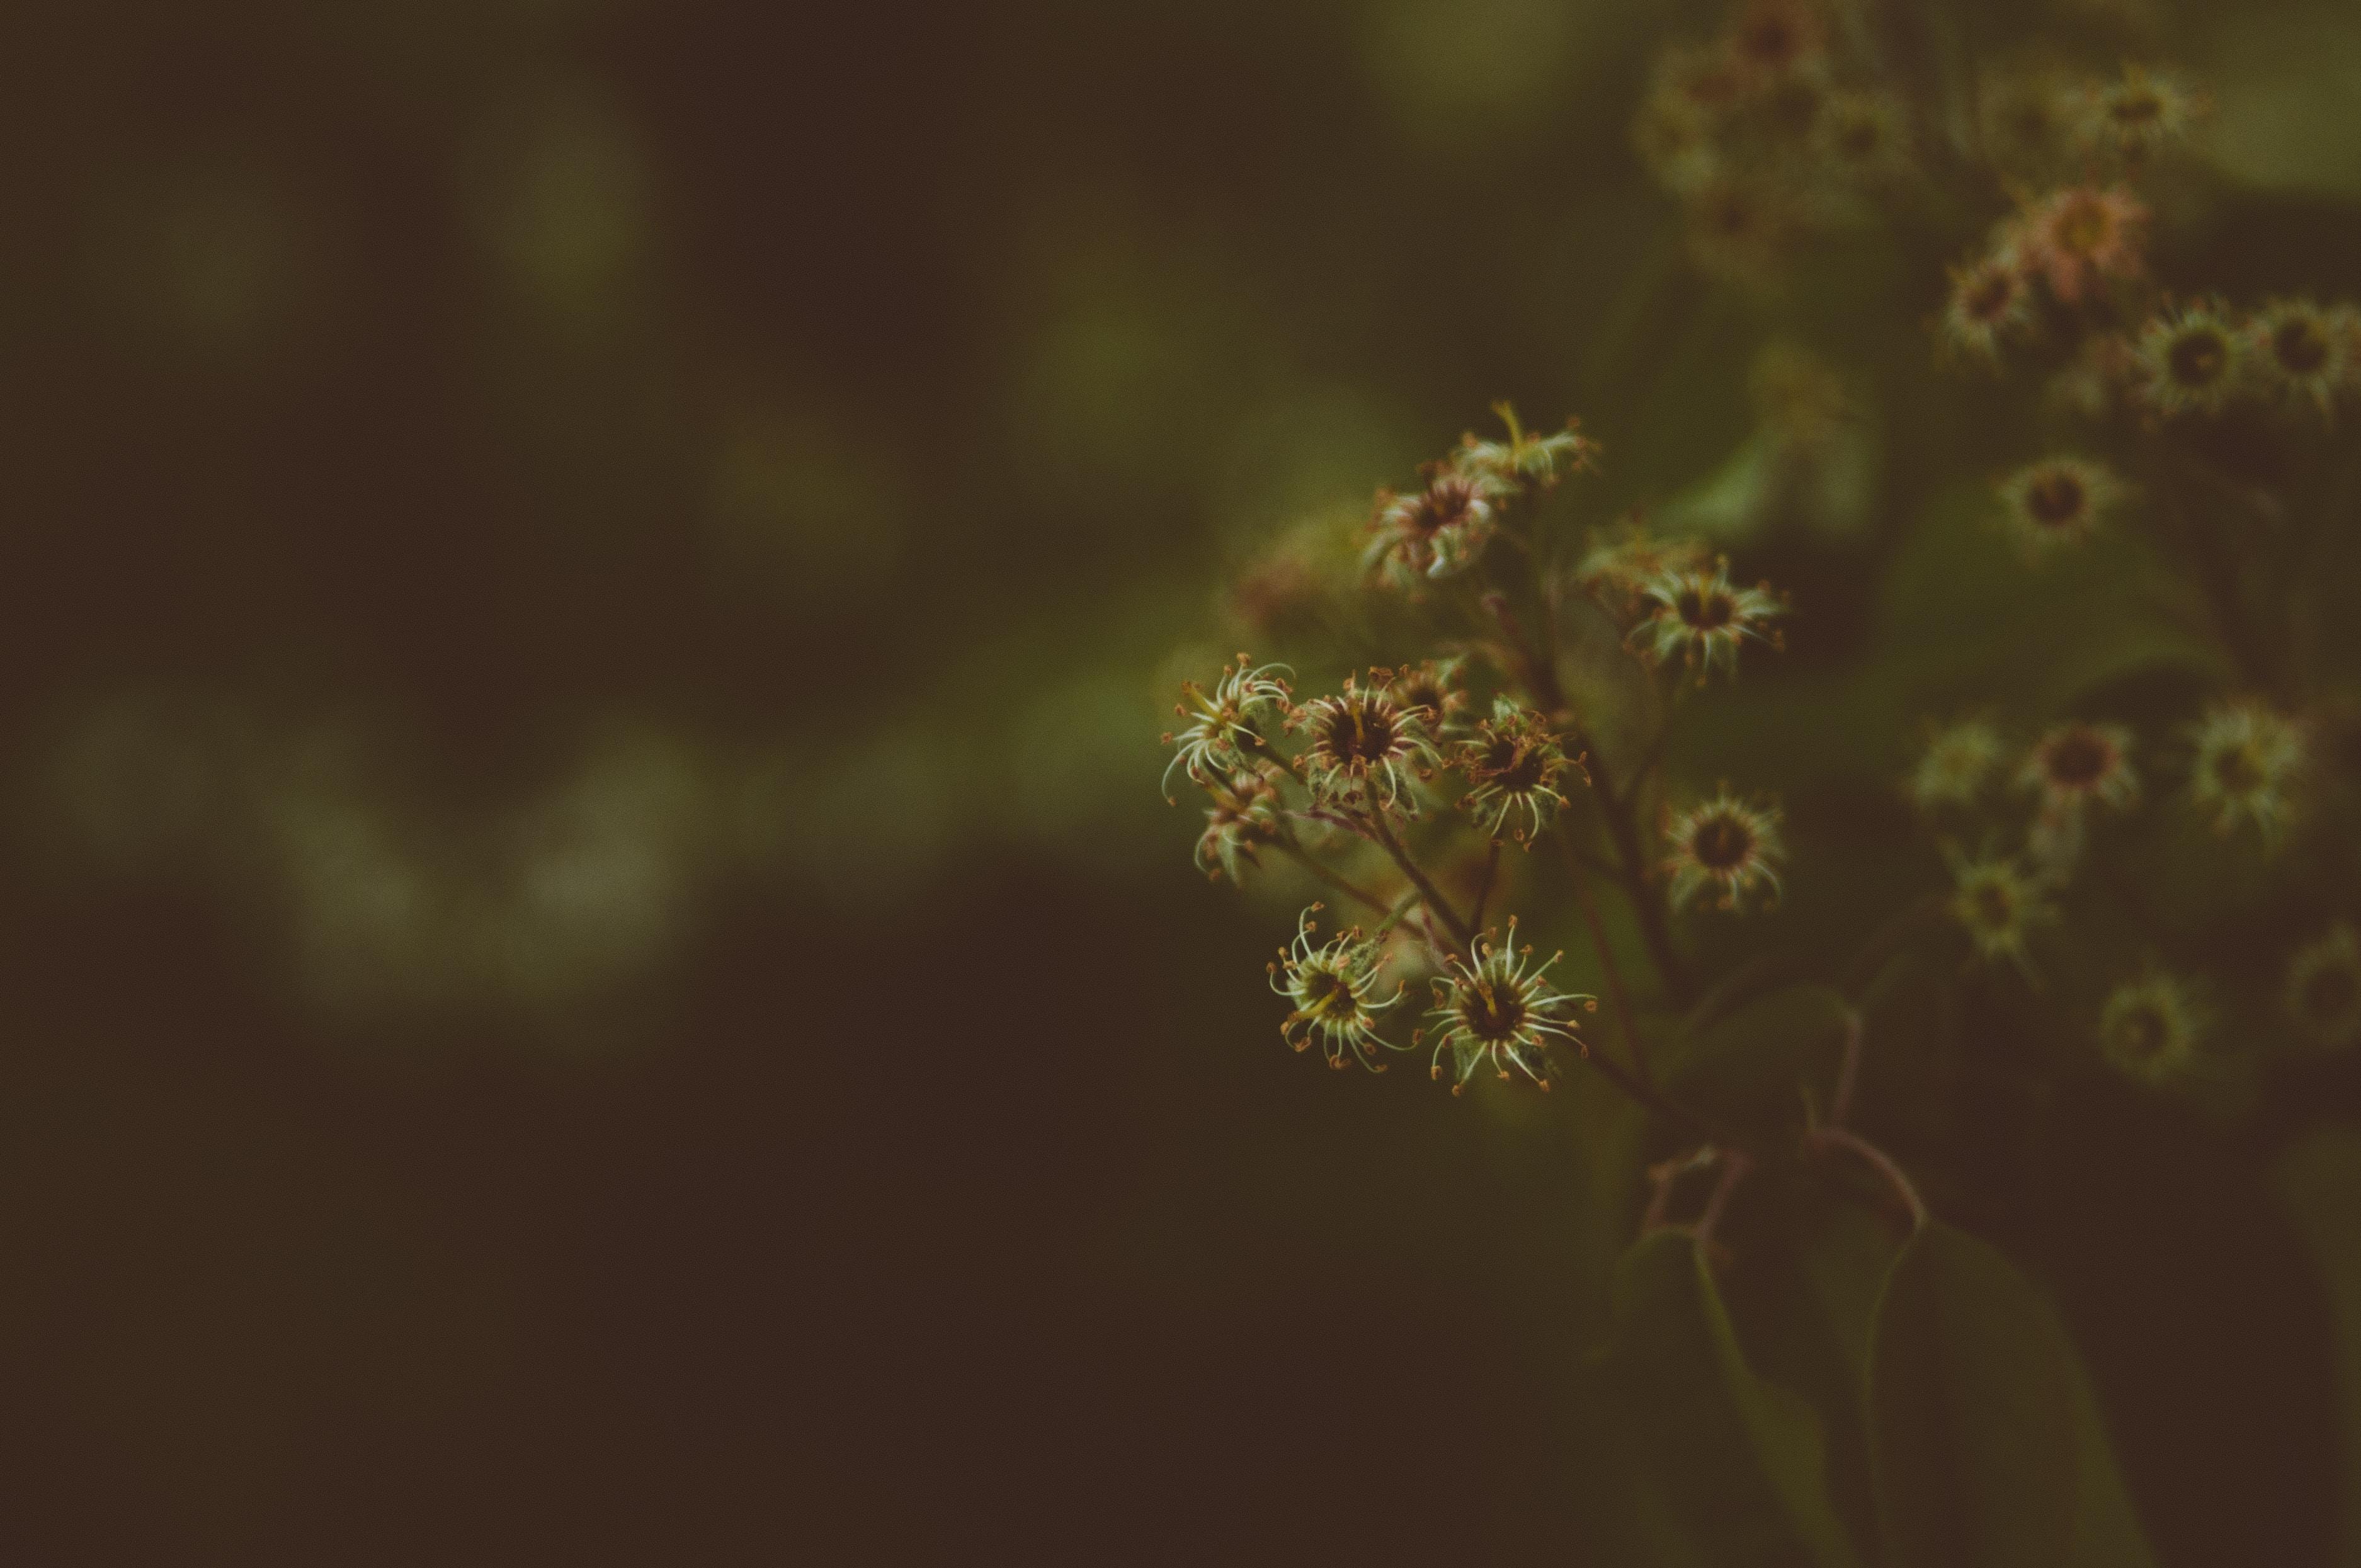 A dim close-up of dry flower heads